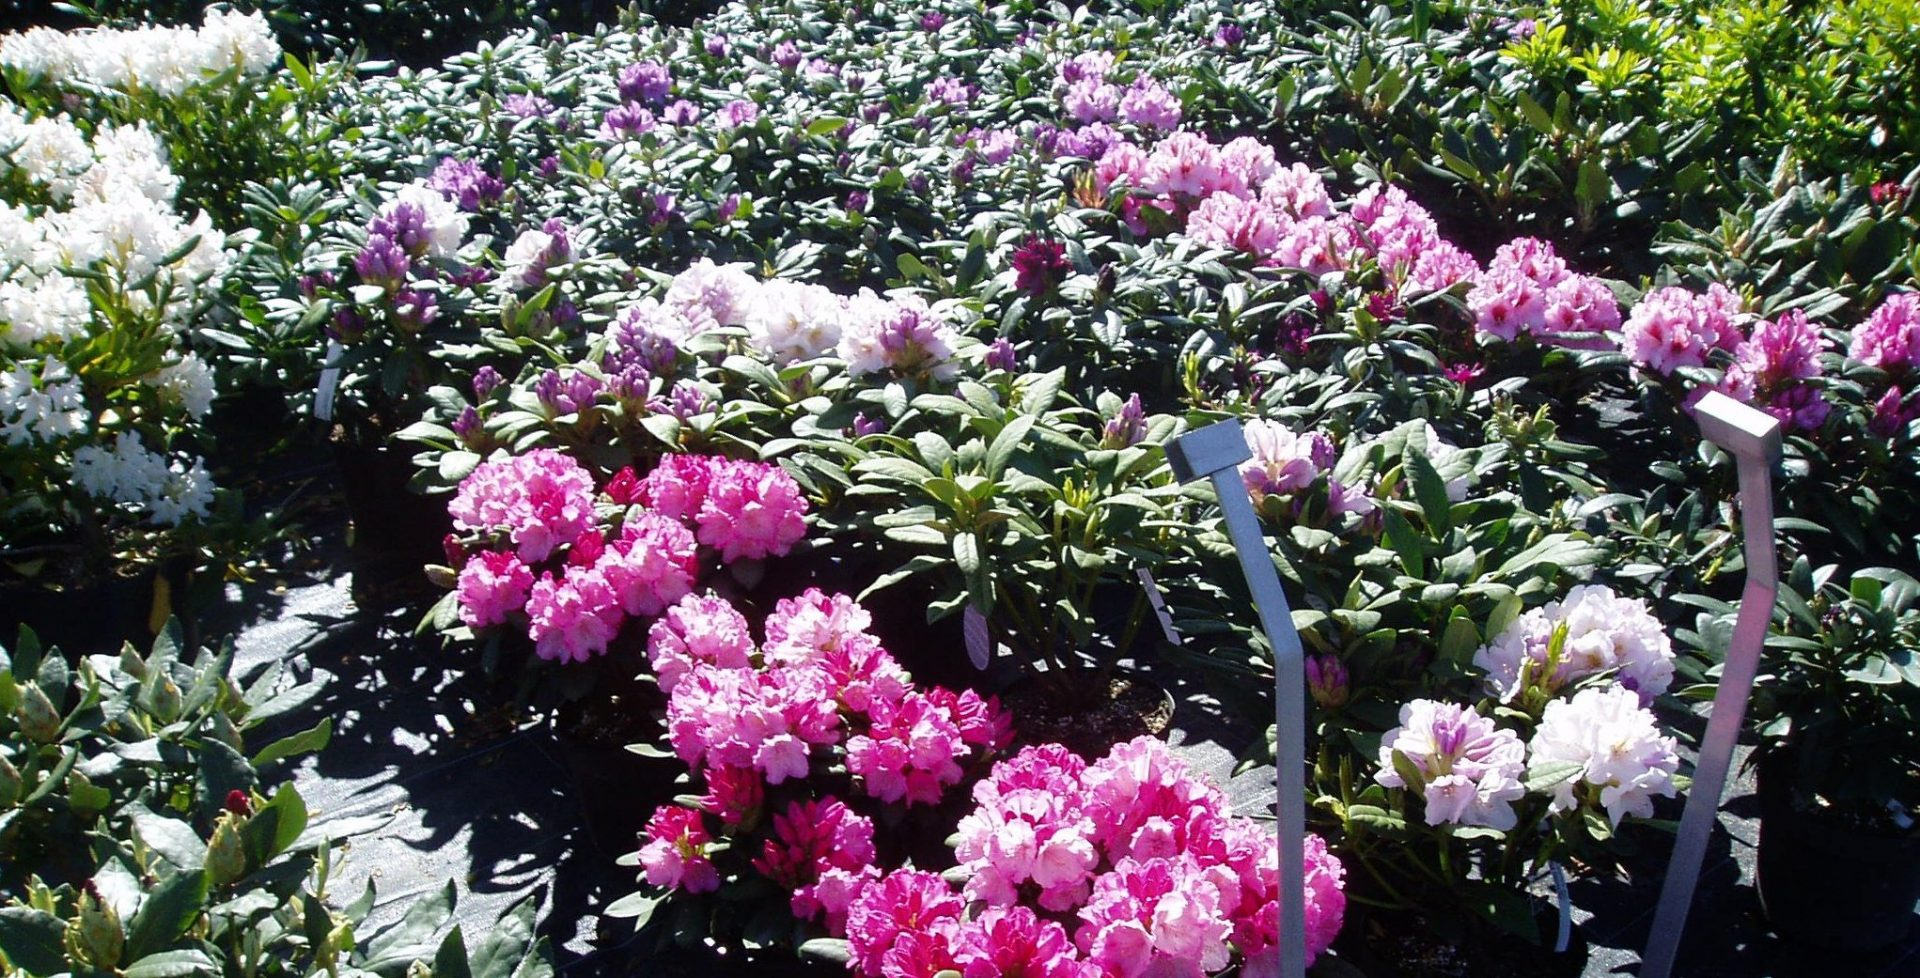 Rhododendron i hvit, lilla, og rosa